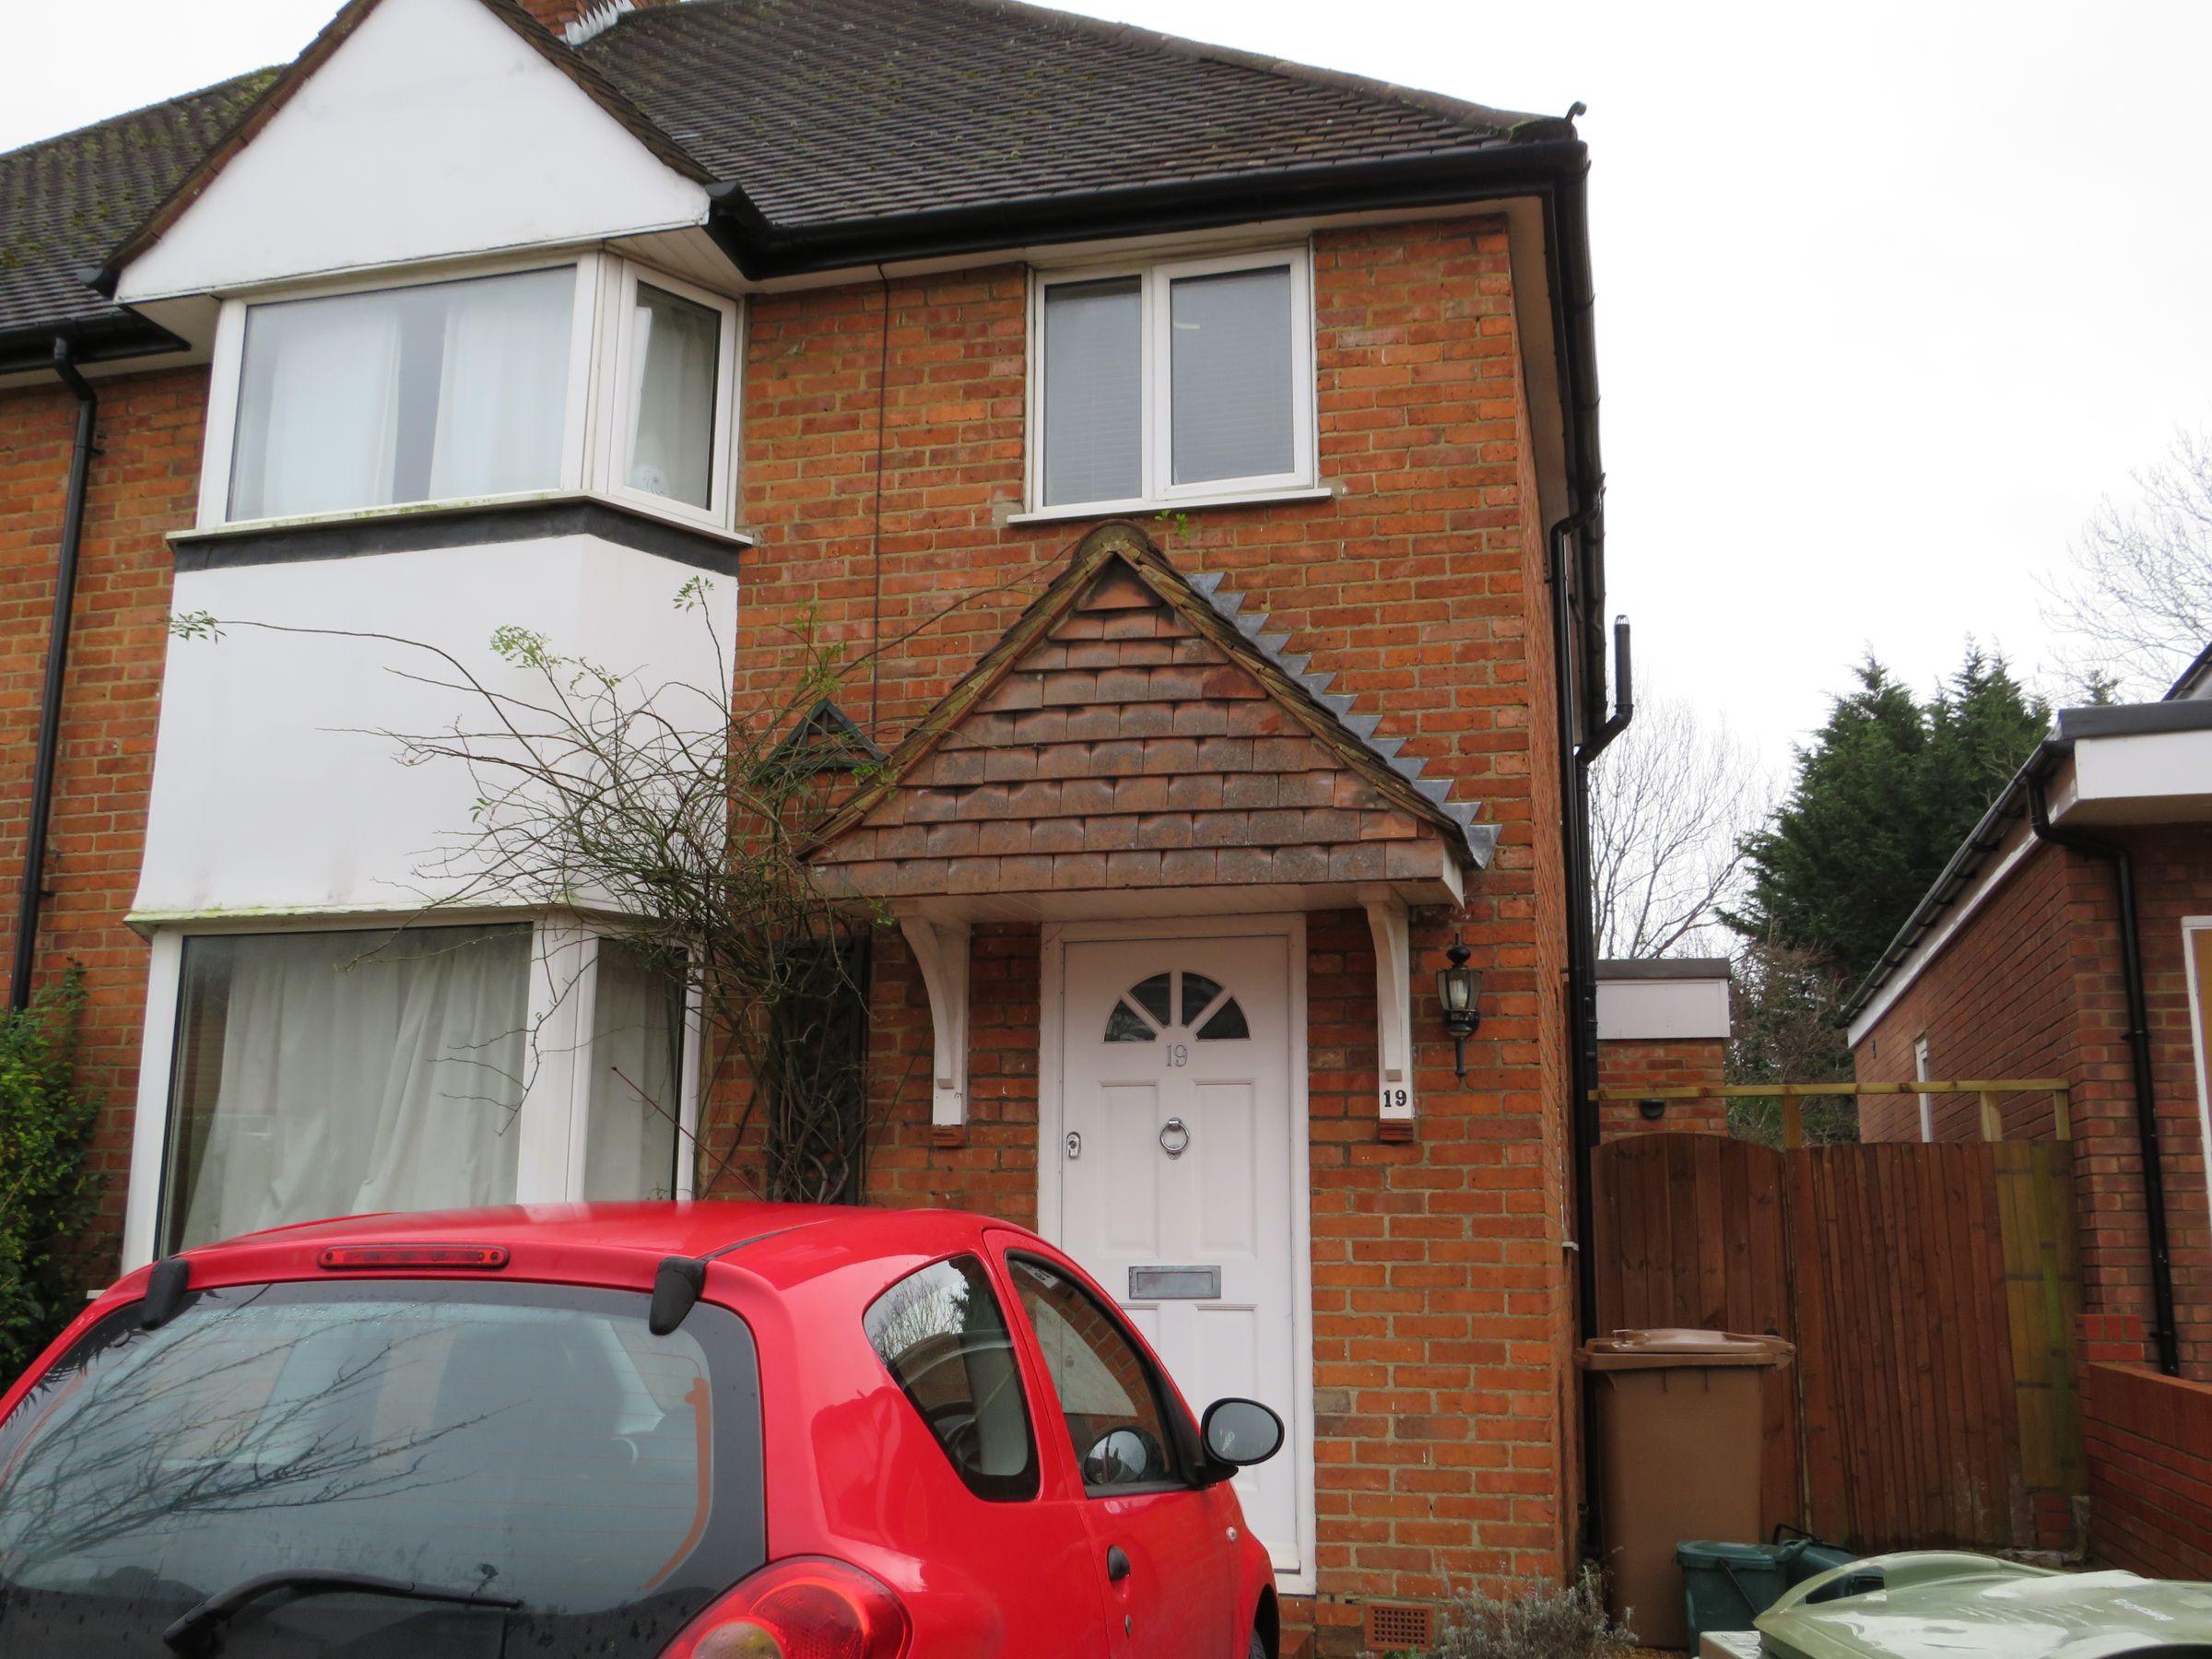 Property photo 1 of 8.